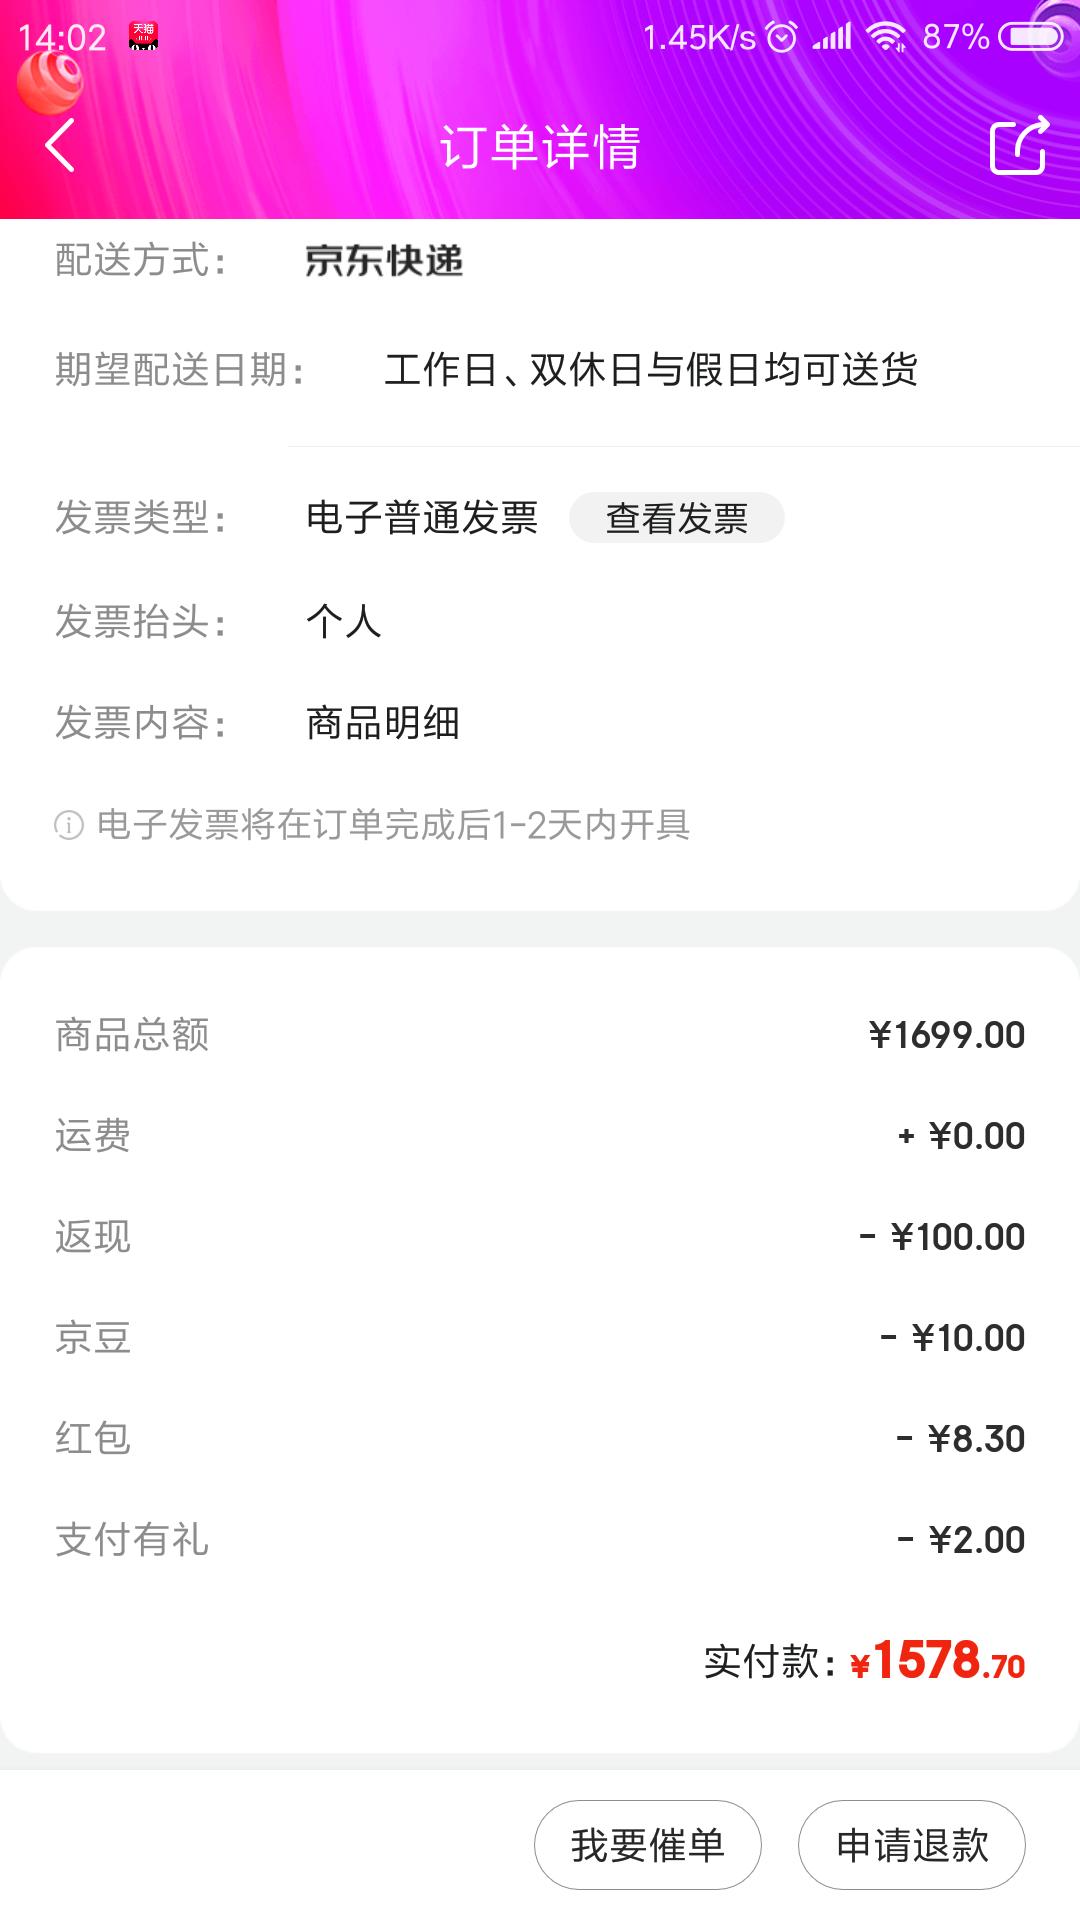 Screenshot_2019-11-12-14-02-03-362_com.jingdong.app.mall.png